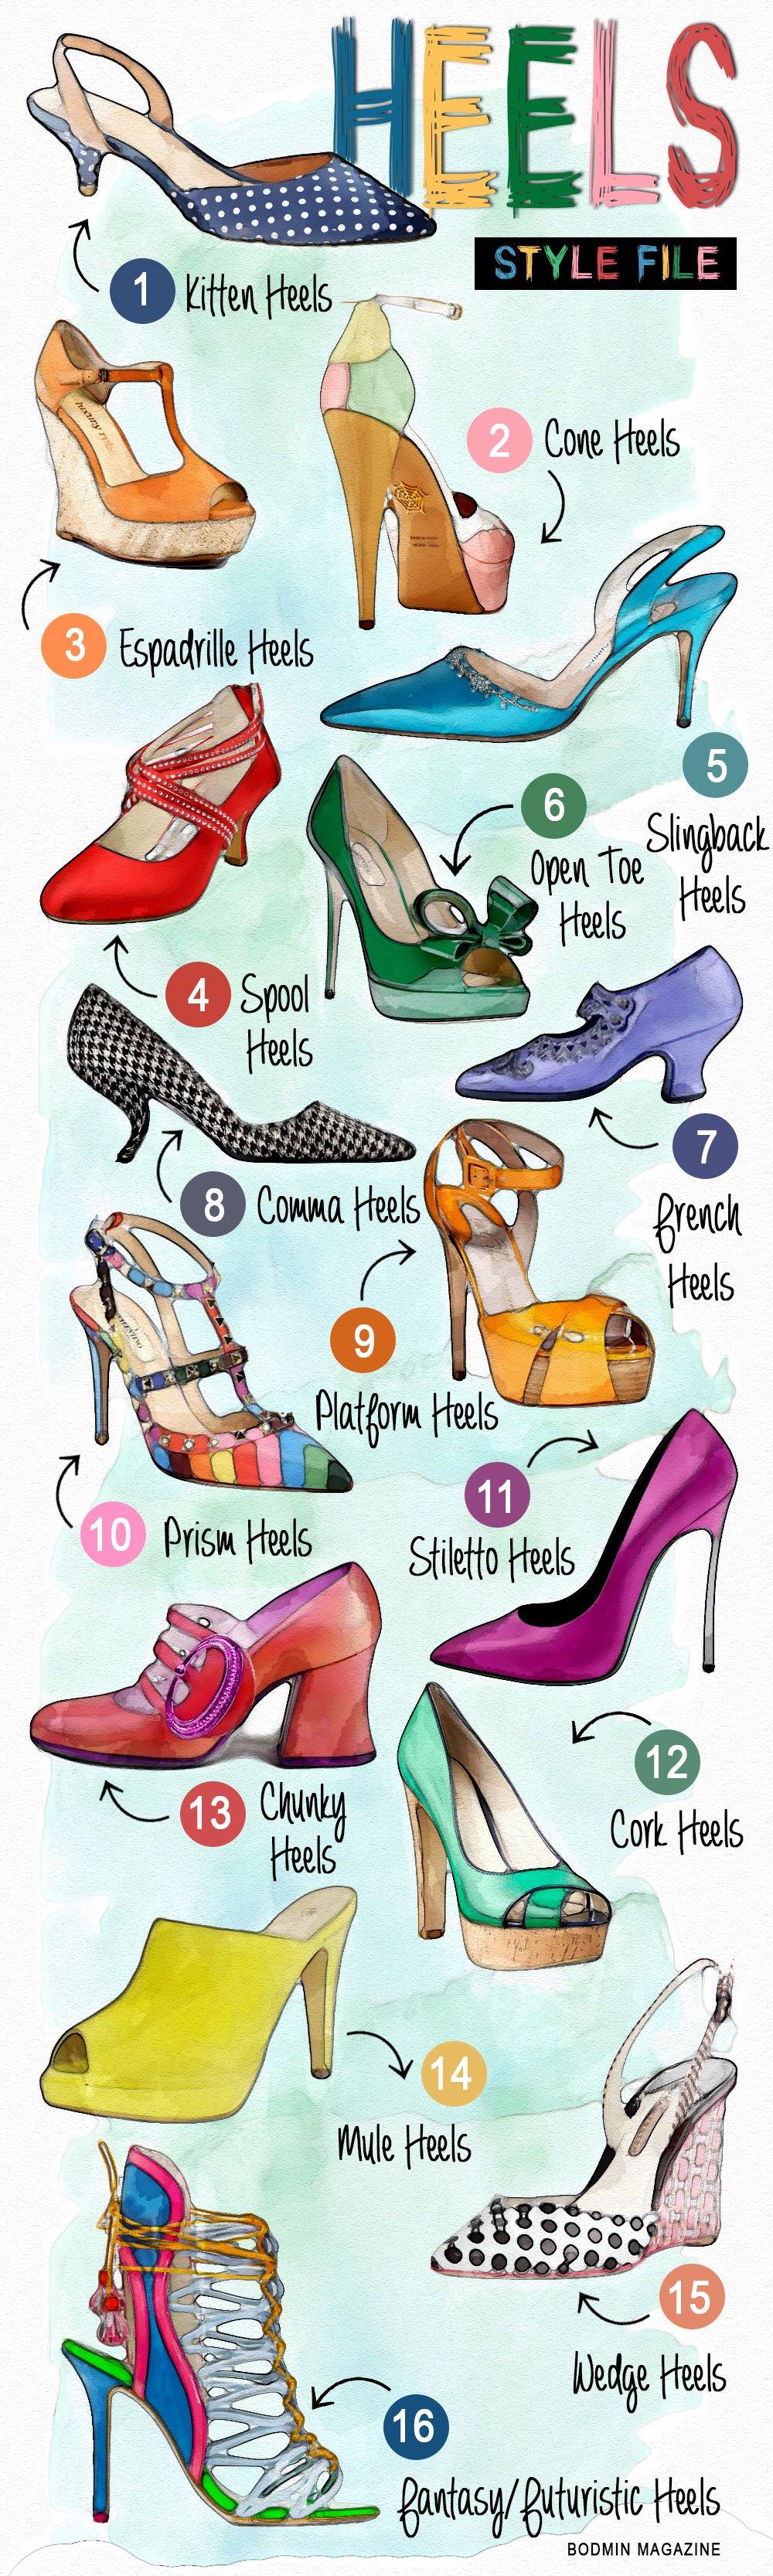 Shoe style chart, Shoes heels, Shoe style